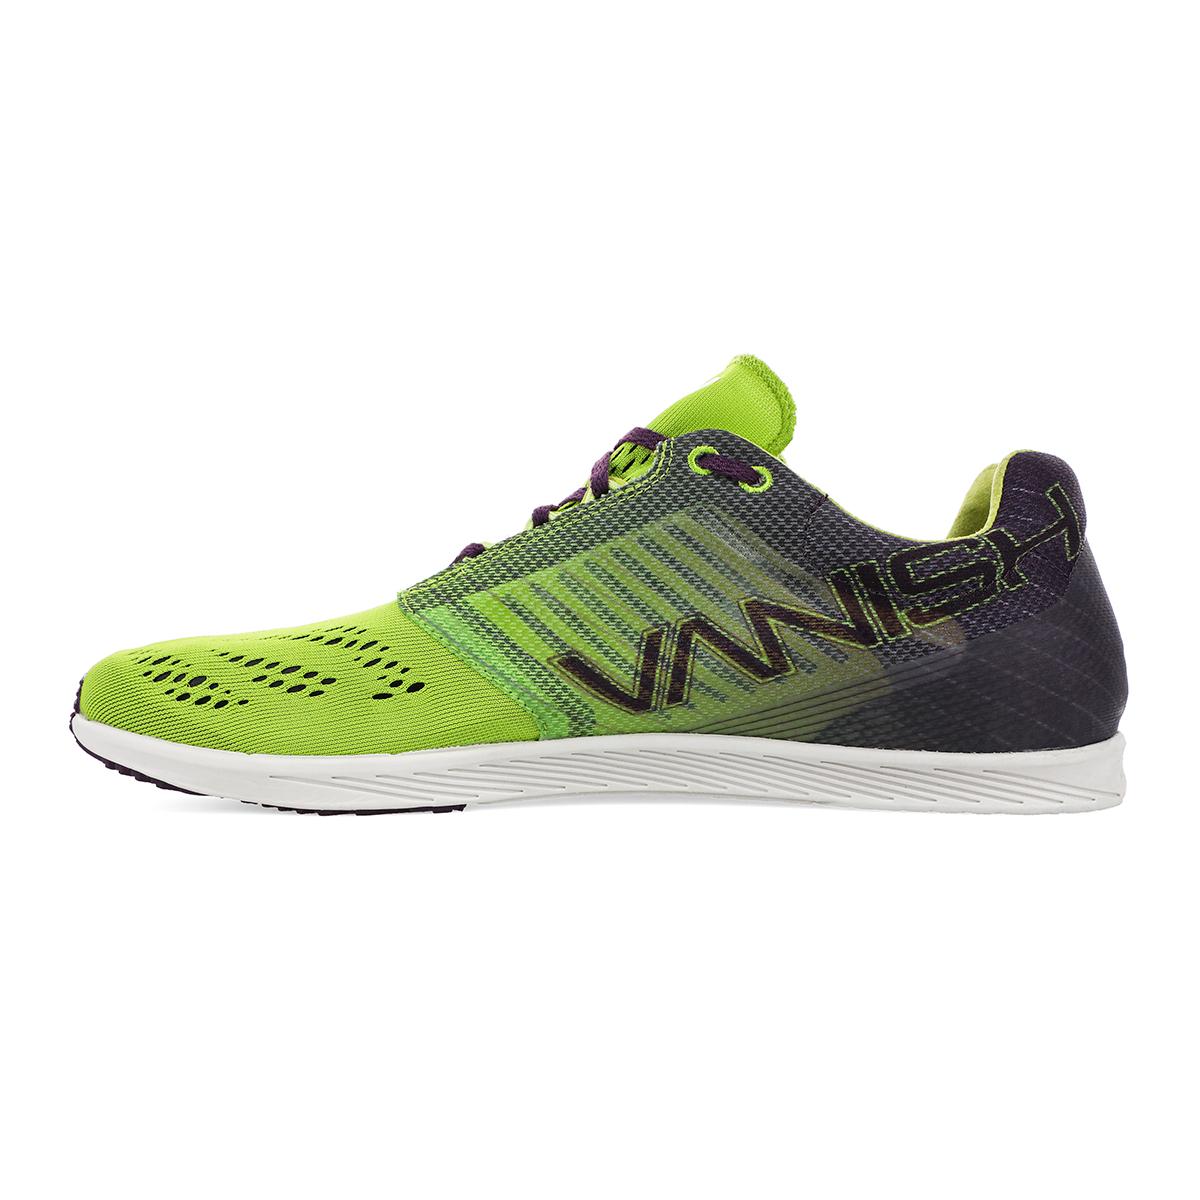 Altra Vanish R Running Shoe - Color: Macaw Green/Purple - Size: M4/W5.5 - Width: Regular, Macaw Green/Purple, large, image 2